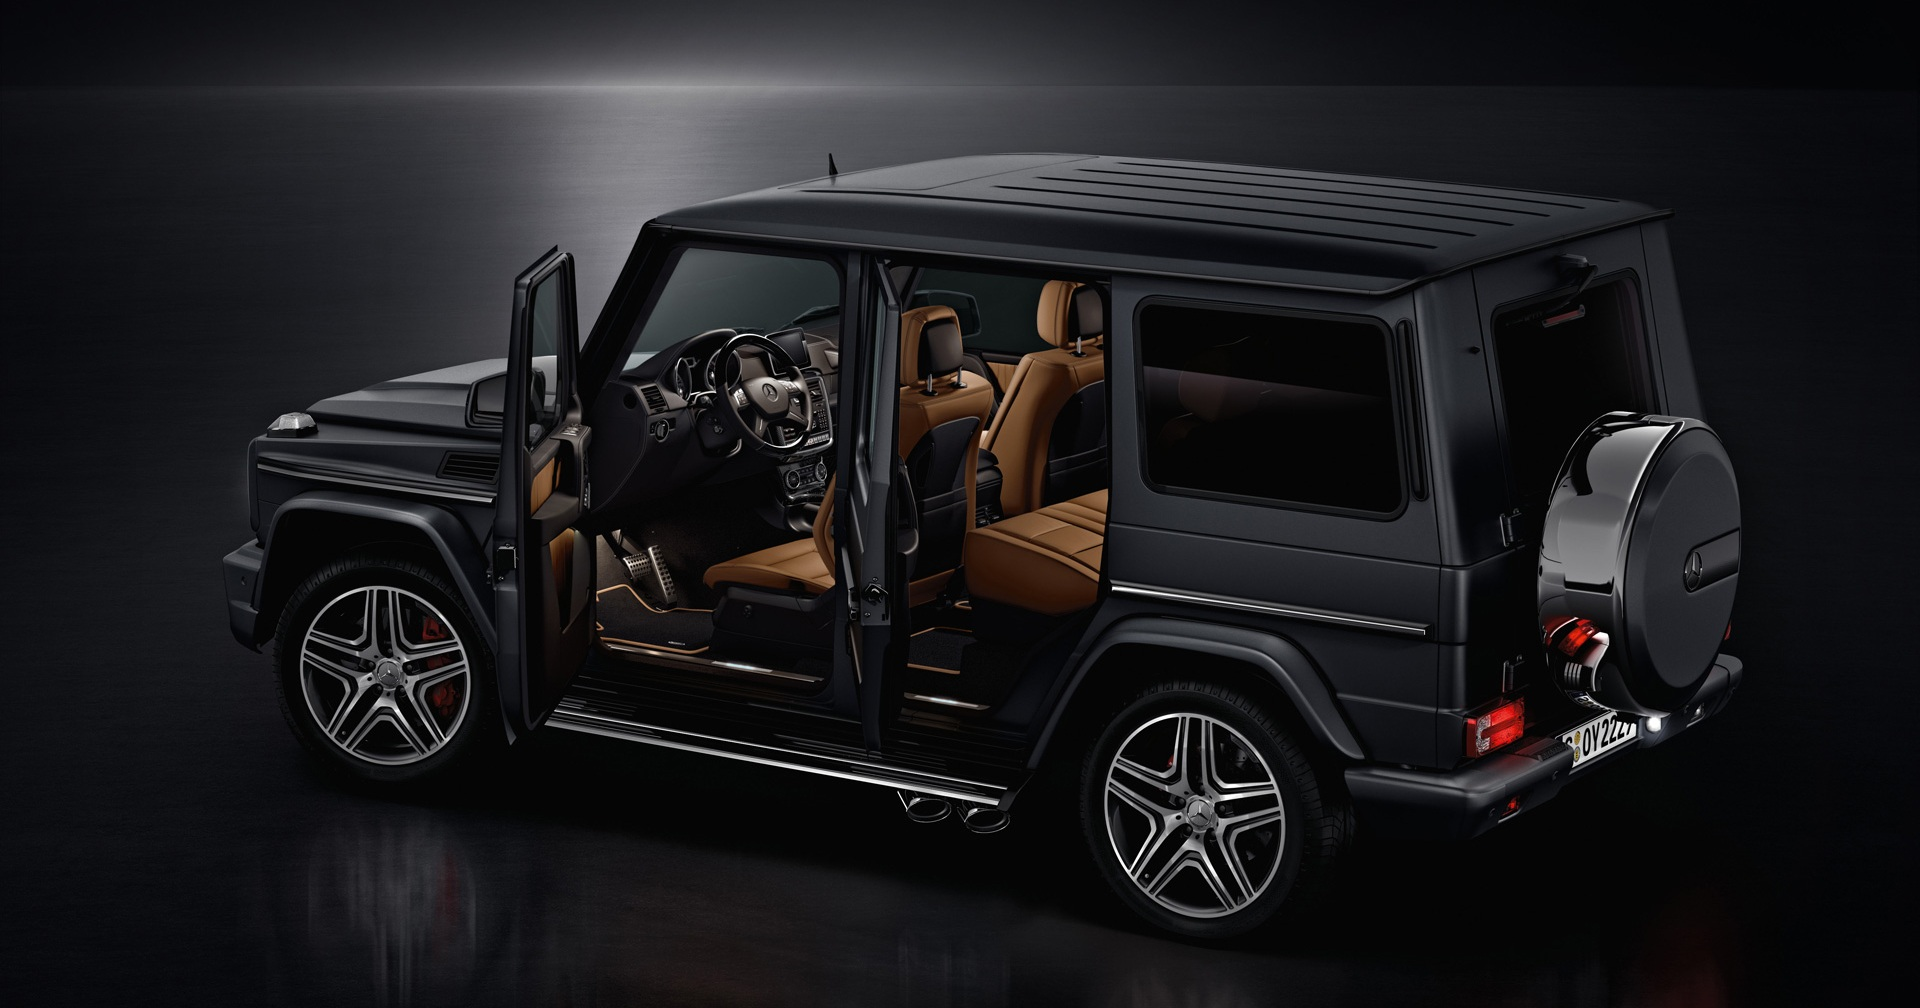 Mercedes benz g65 amg 2014 nico potente musculoso y for G klasse amg interieur